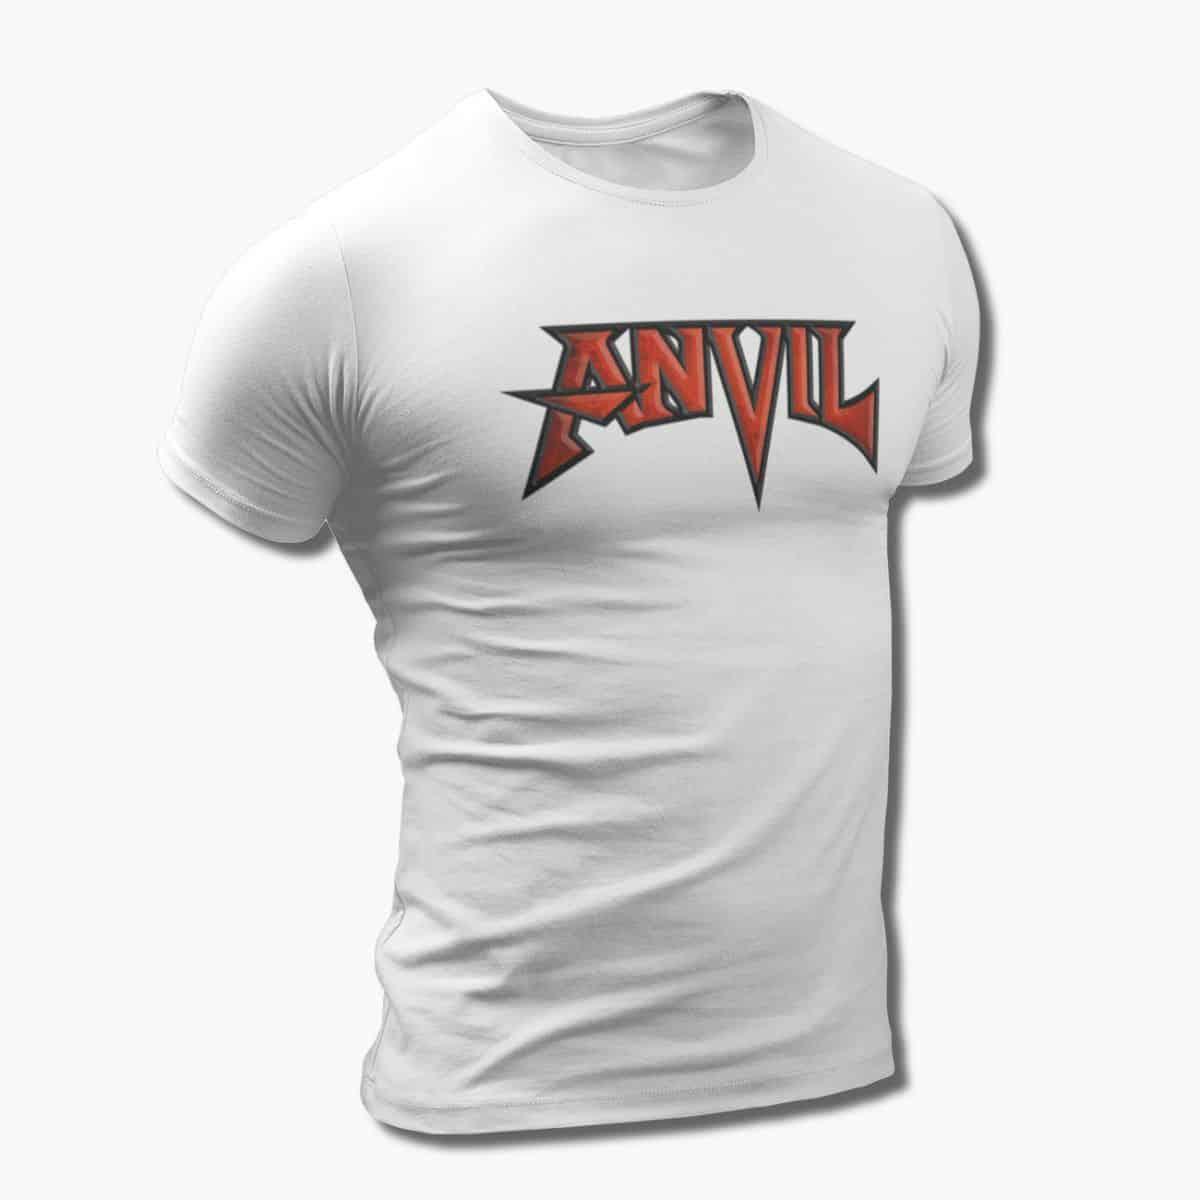 Anvil Band T Shirt Anvil Logo Tee Heavy Metal Merch Metal Band T Shirt Metal Band Tee Shirts